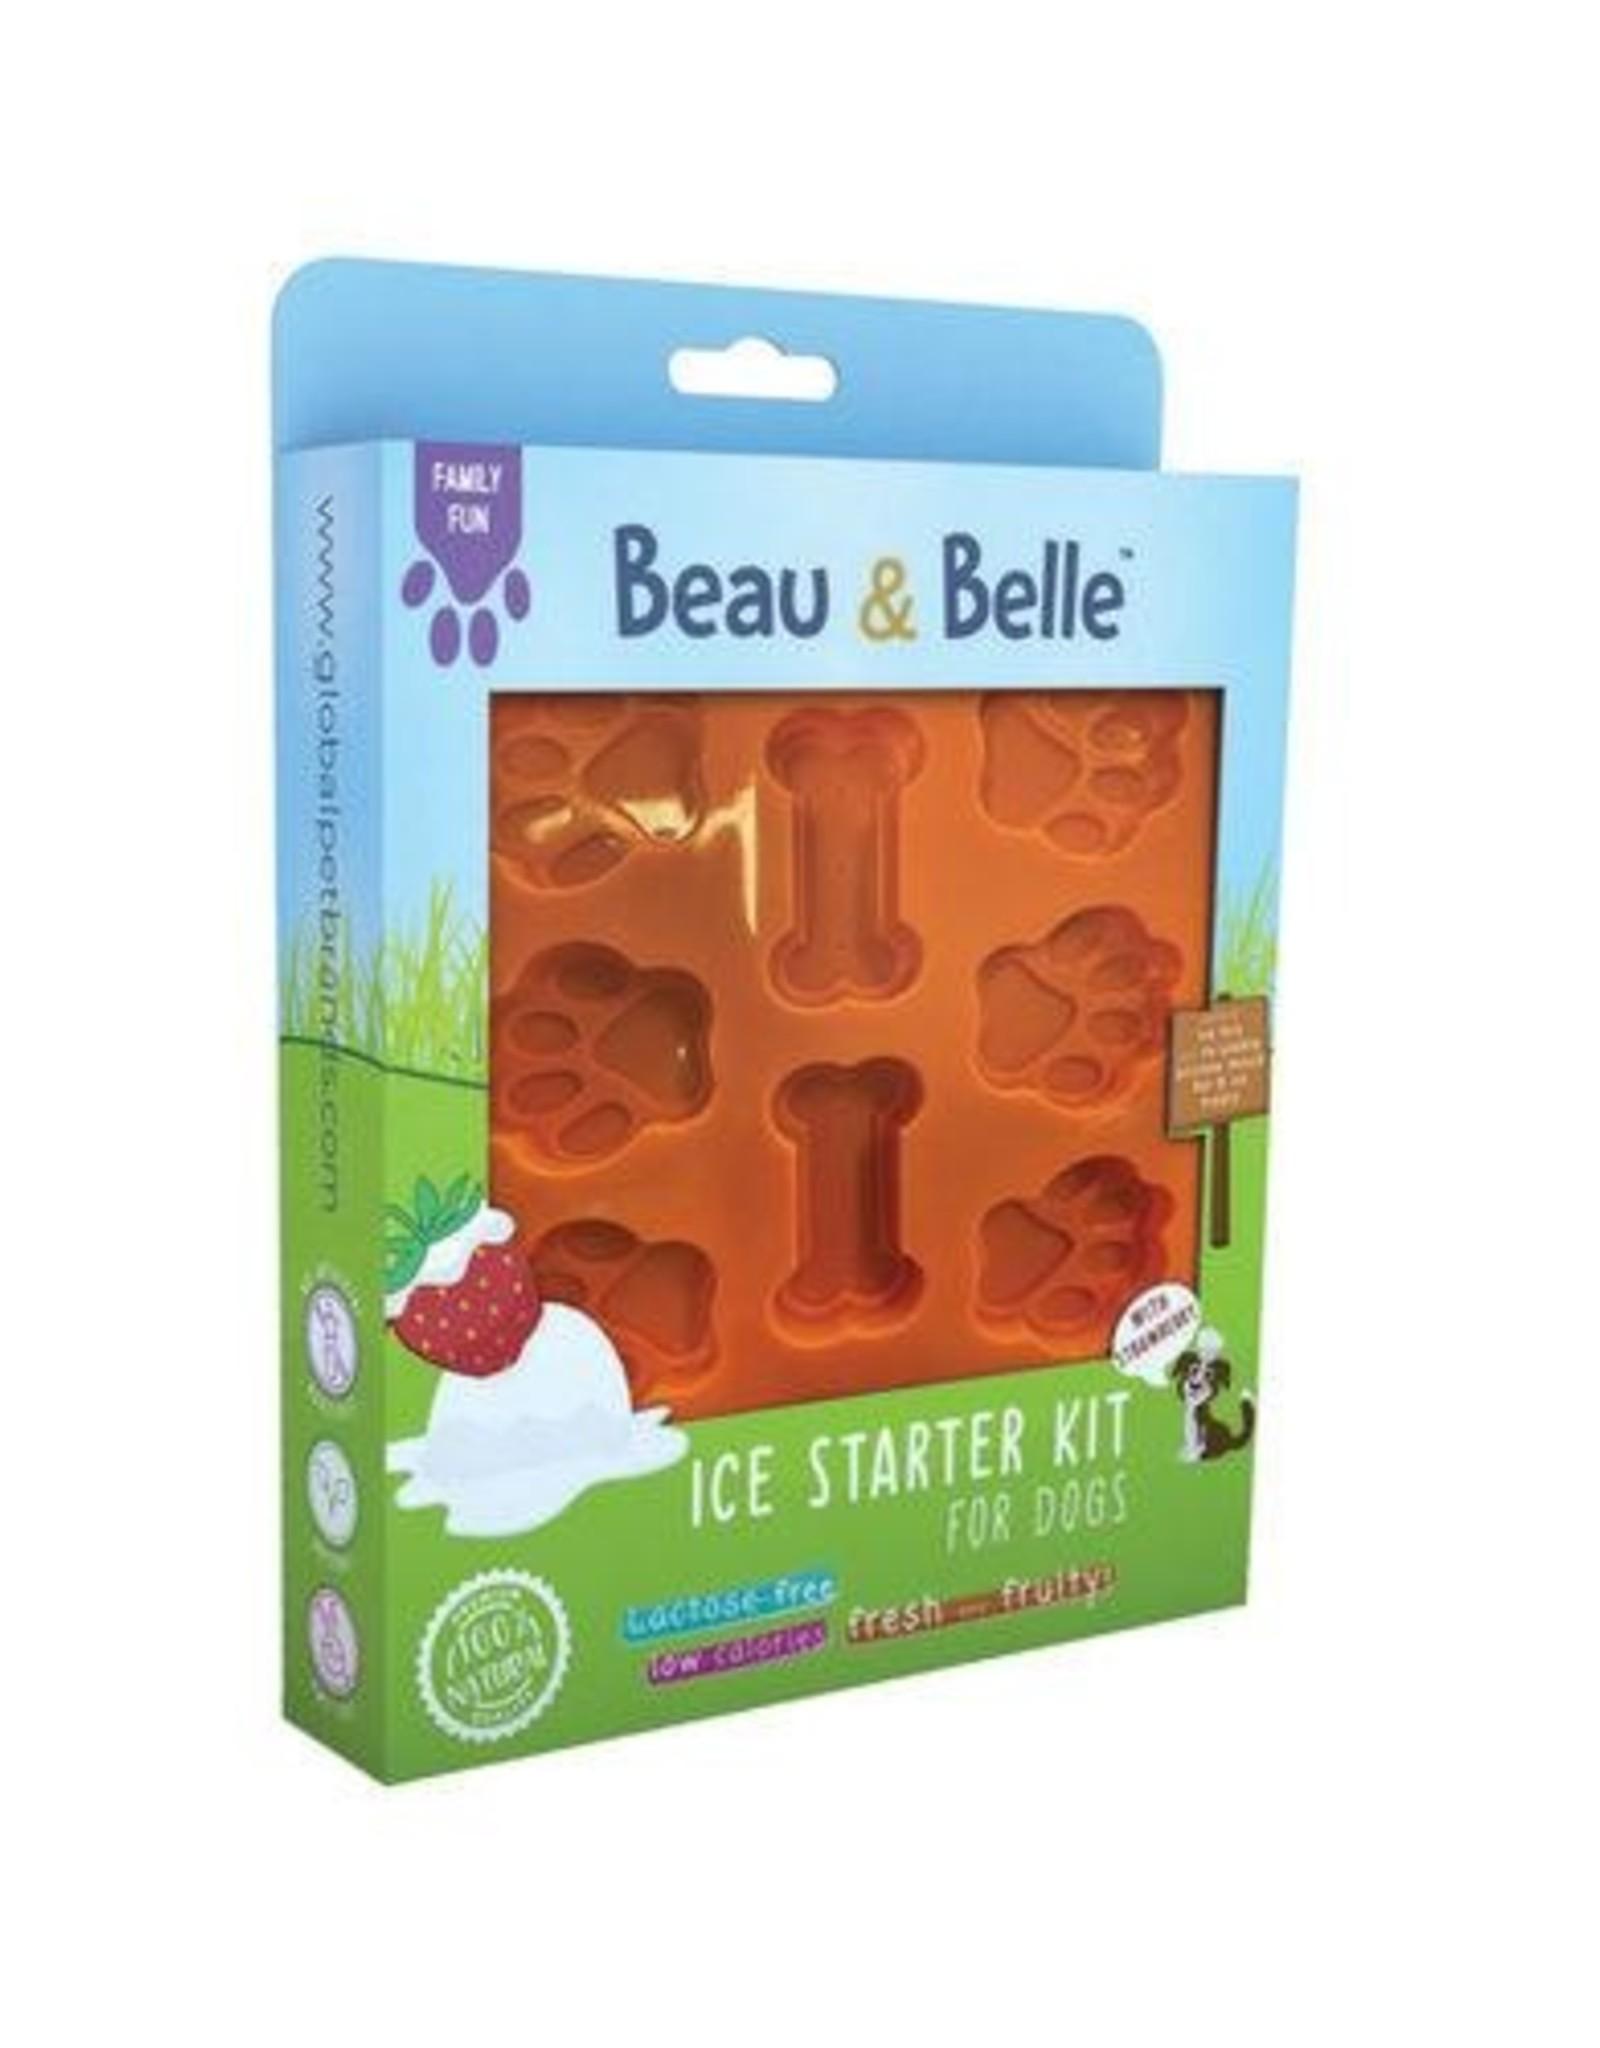 Beau & Belle Ice starter kit